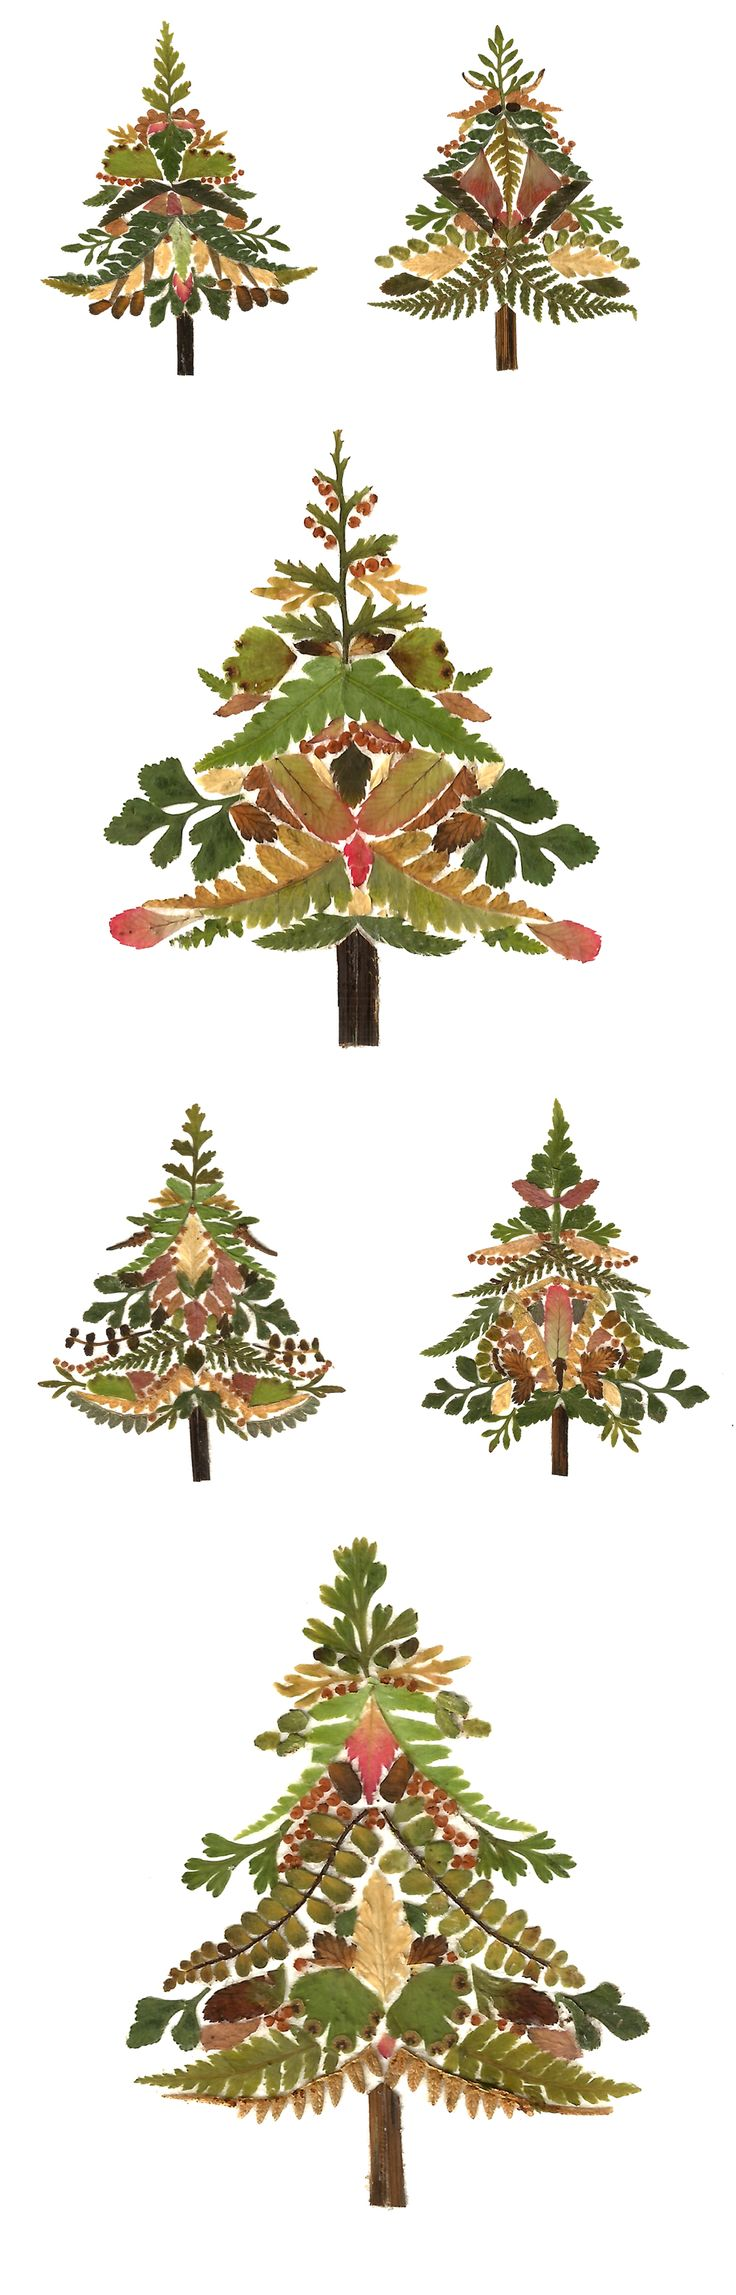 A Fern Christmas | Helen Ahpornsiri Illustration